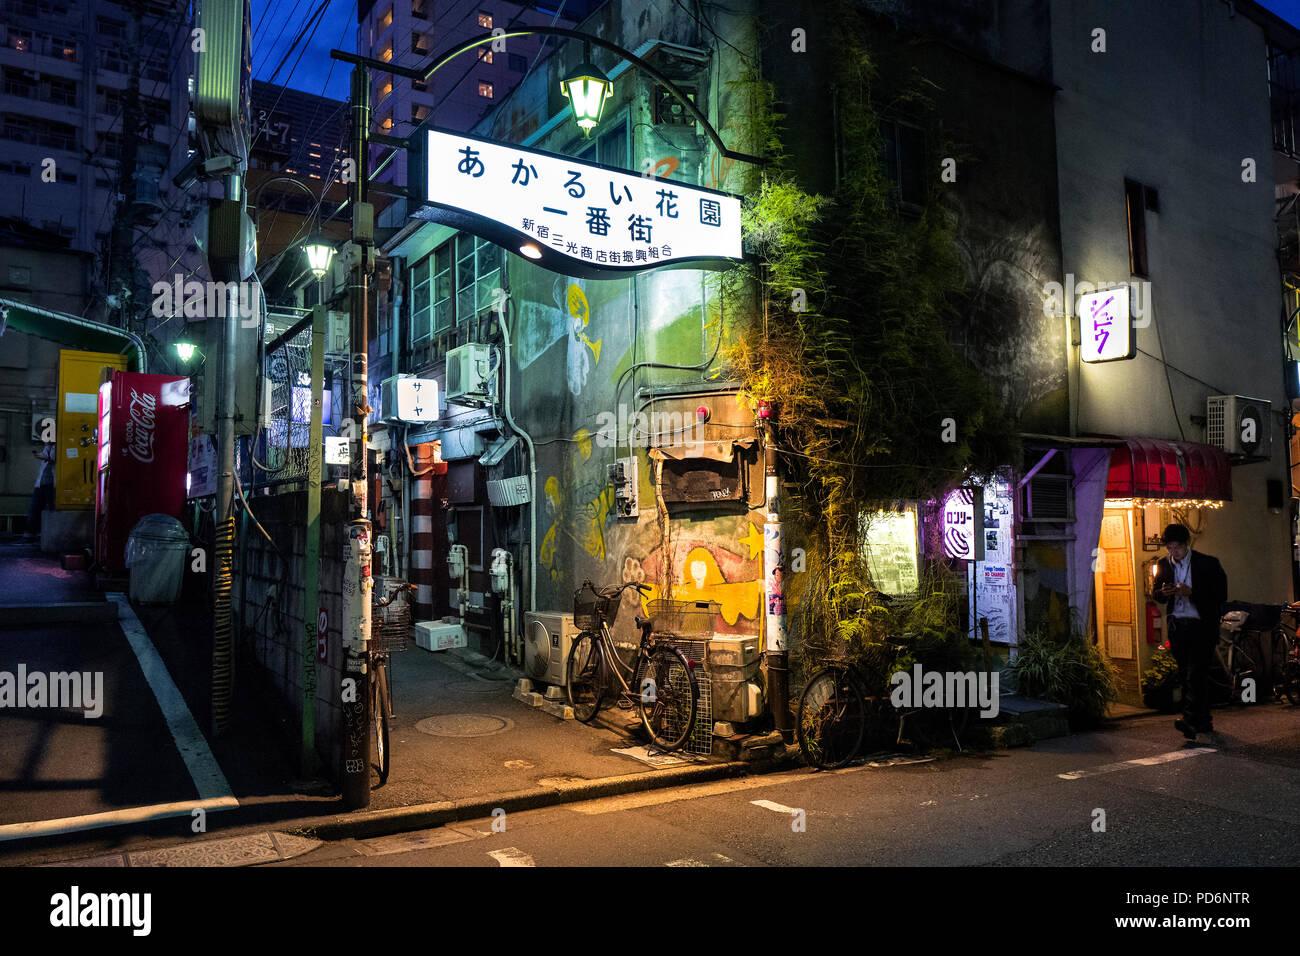 La isla de Japón, Honshu, Kanto, Tokio, el Golden Gai distrito. Imagen De Stock